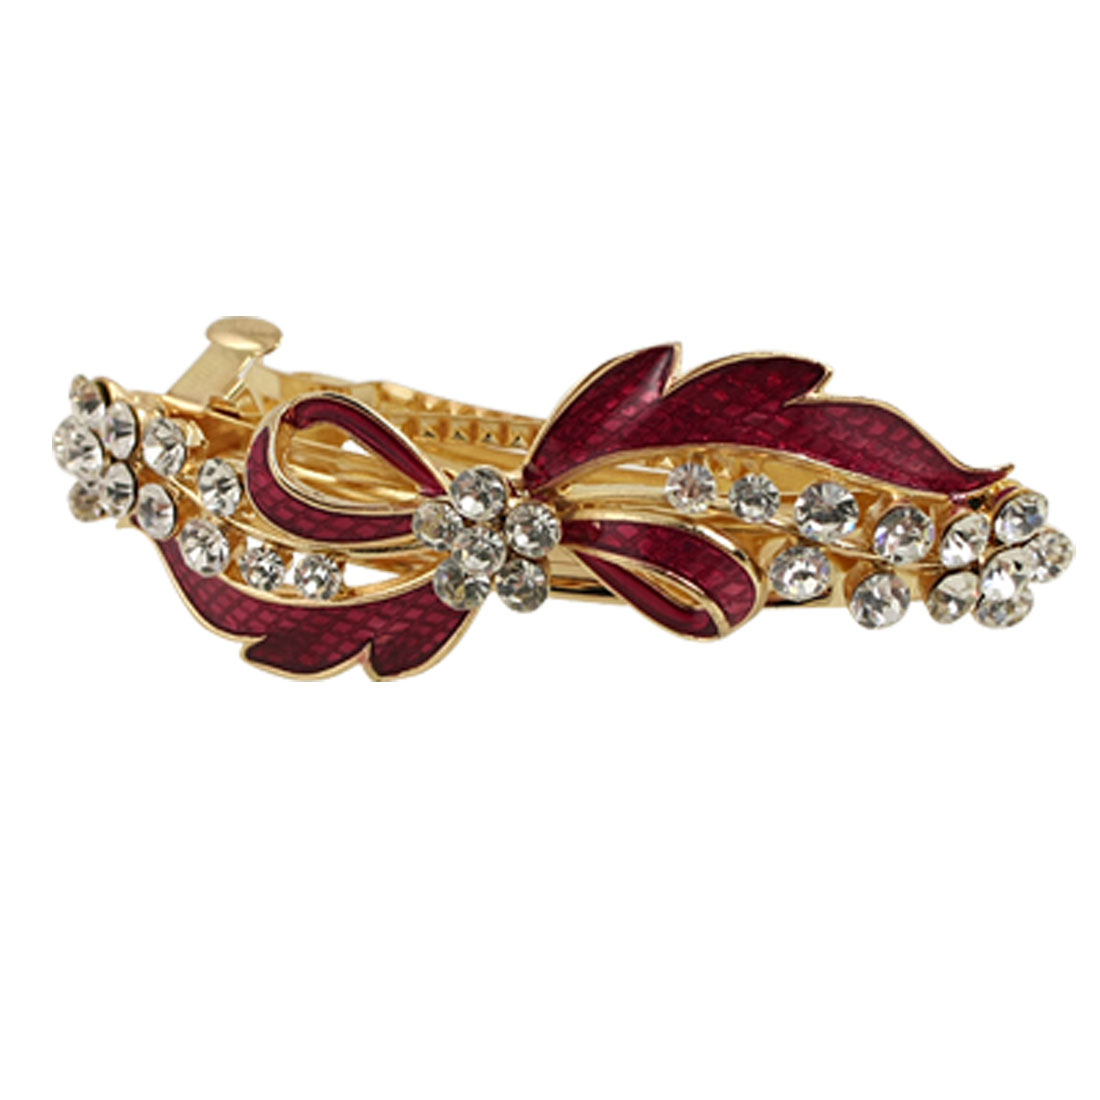 Rhinestone Detail Red Bowknot Metal Hair Clip Barrette Gold Tone